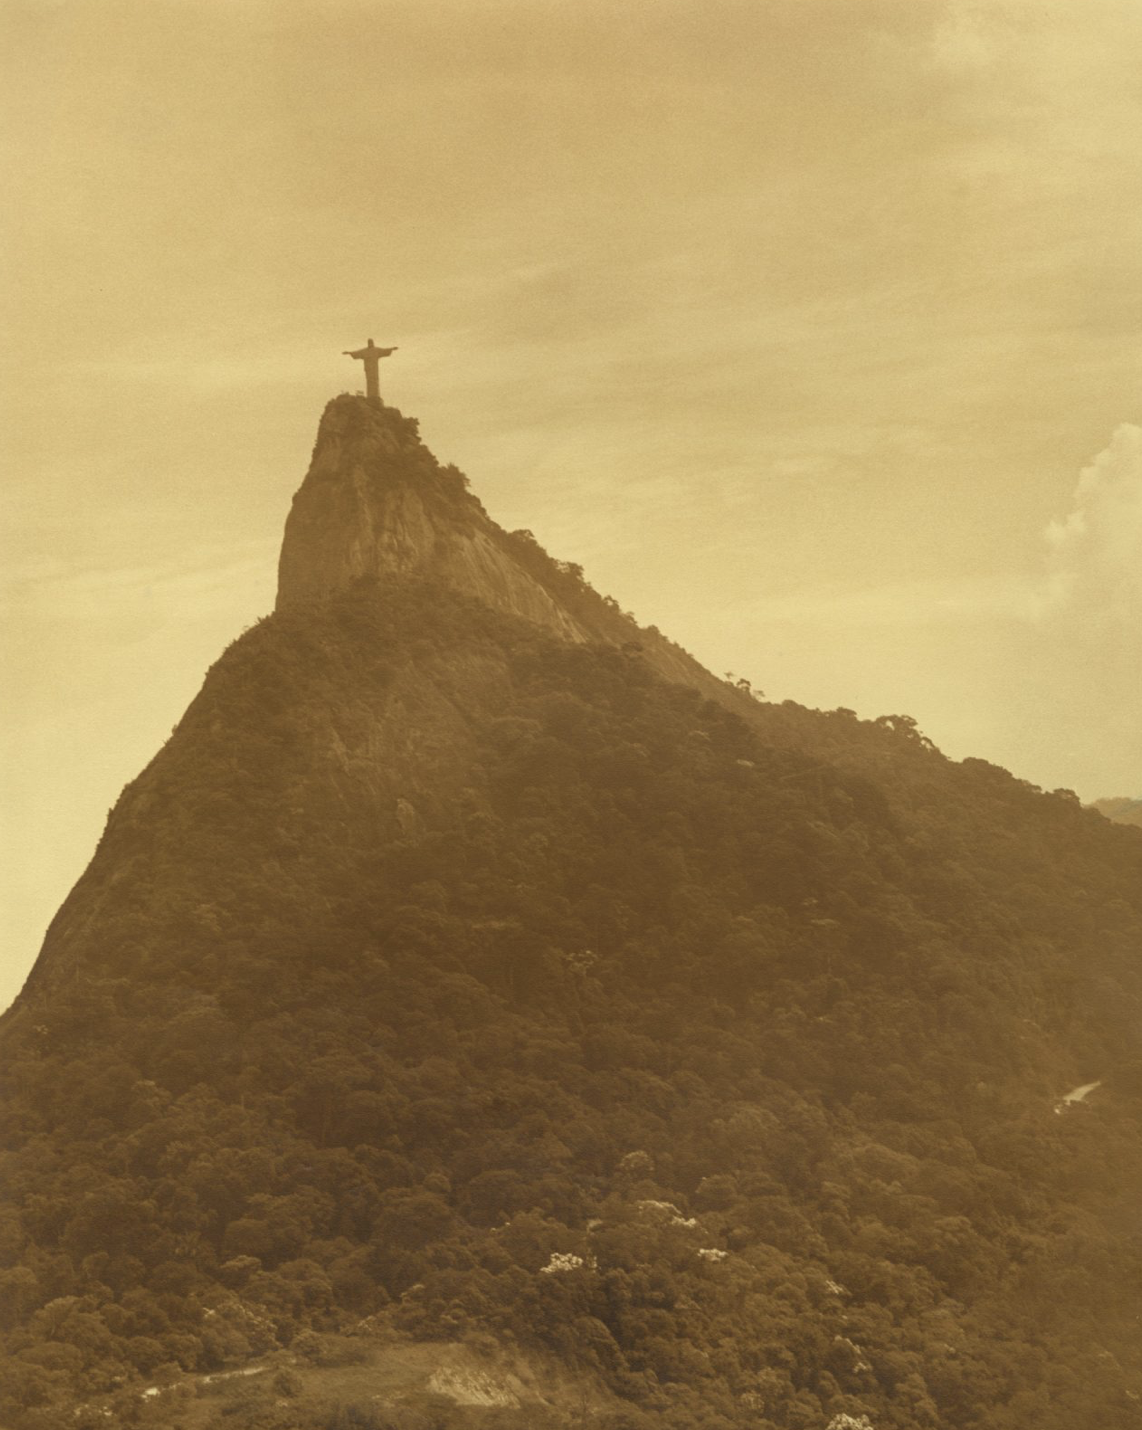 Rio de Janeiro Bruce Weber - Inner pages Landscape